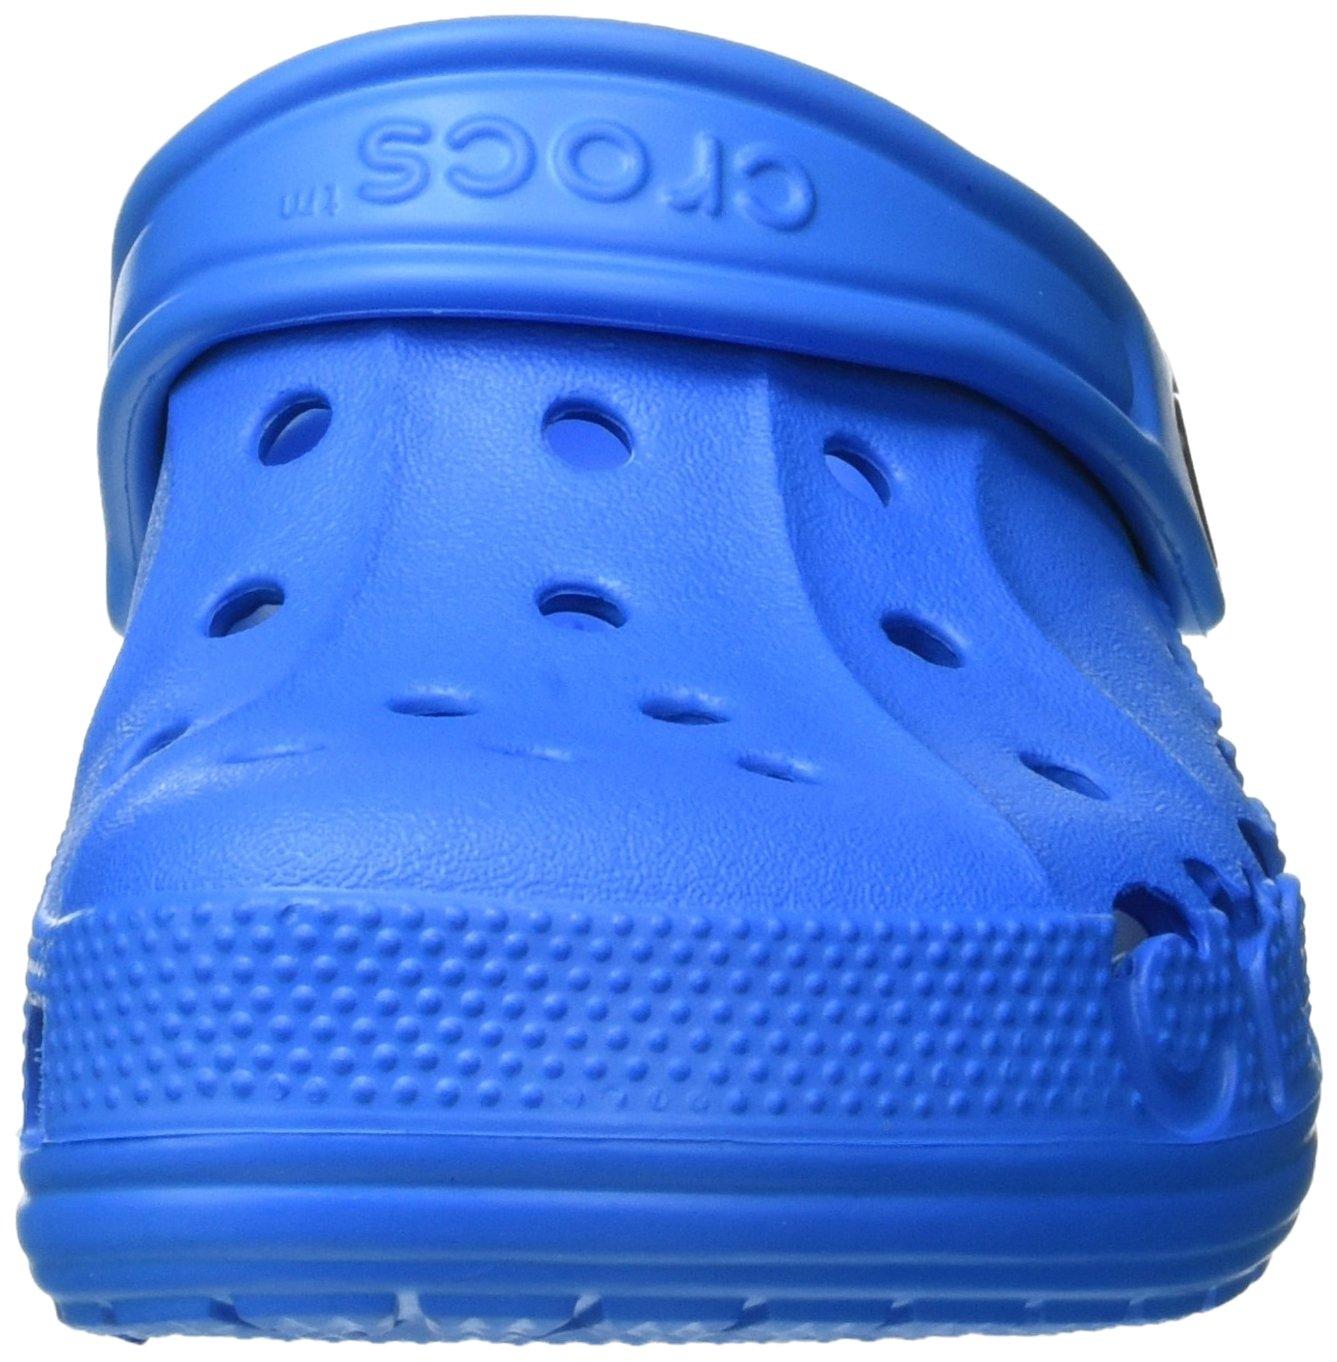 Crocs Kids' Baya 10190 Clog, Ocean, 8-9 M US Toddler by Crocs (Image #4)